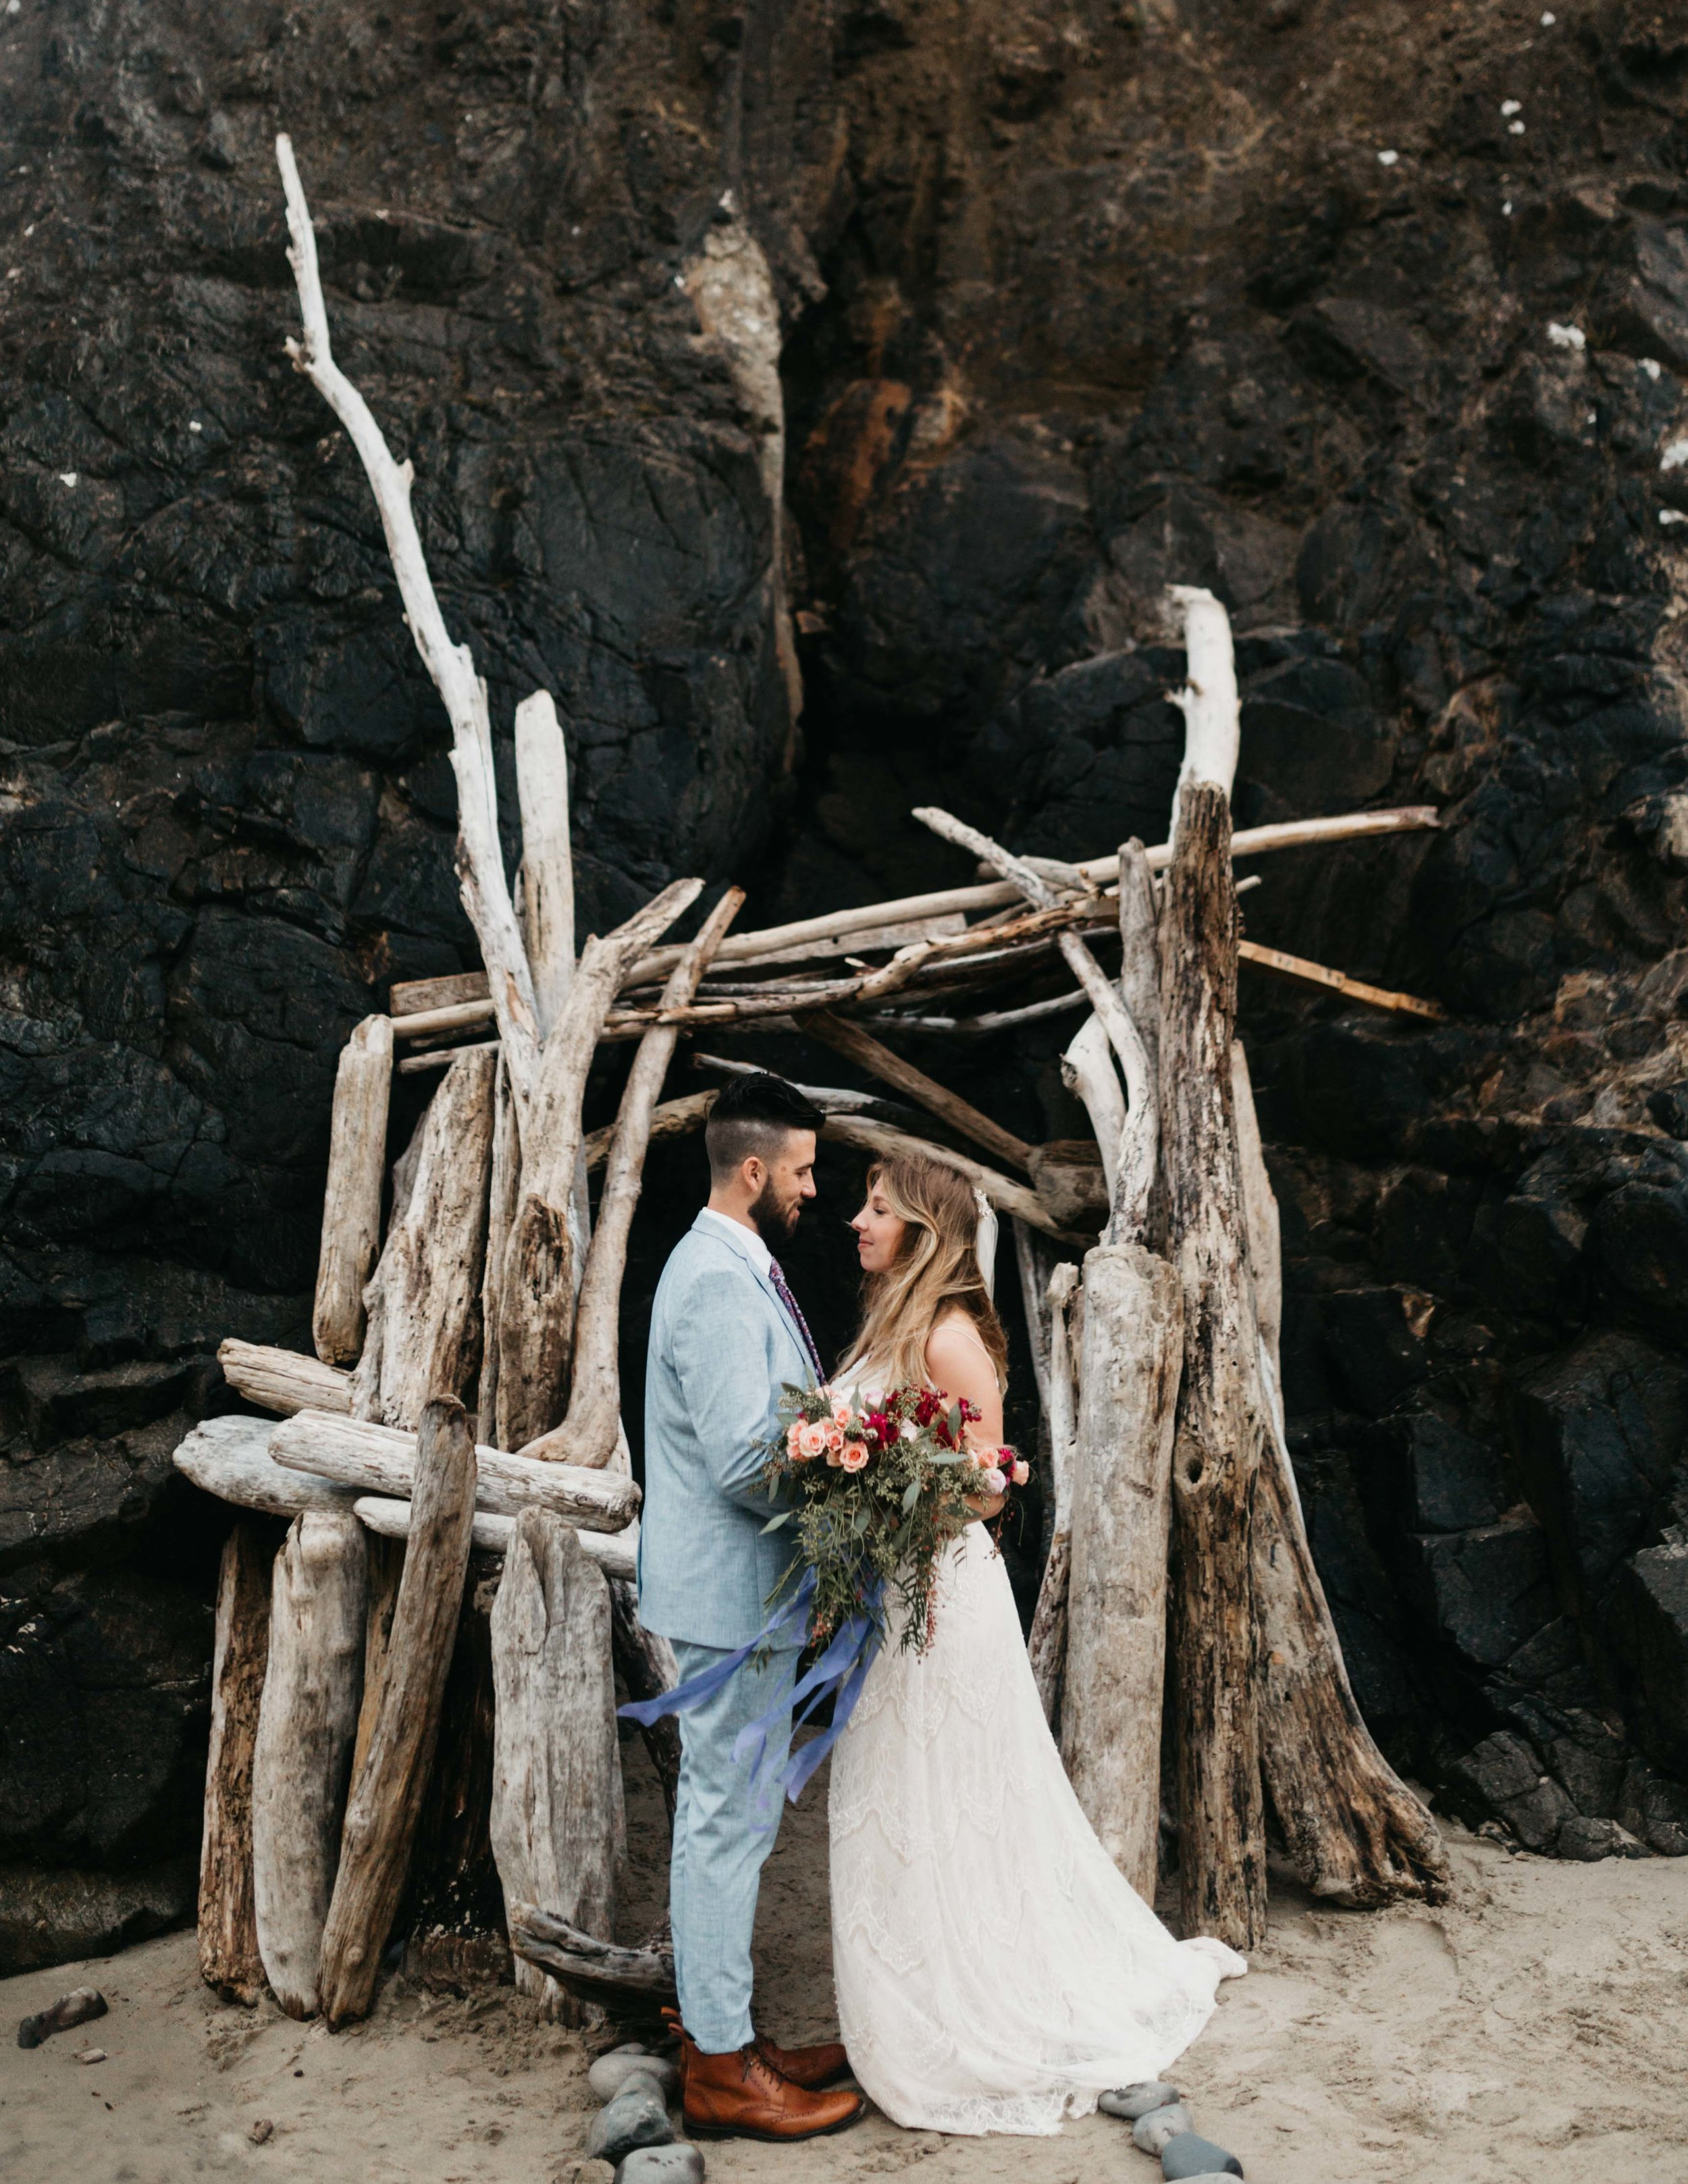 Utah-Wedding-Utah-Photographer-14.jpg